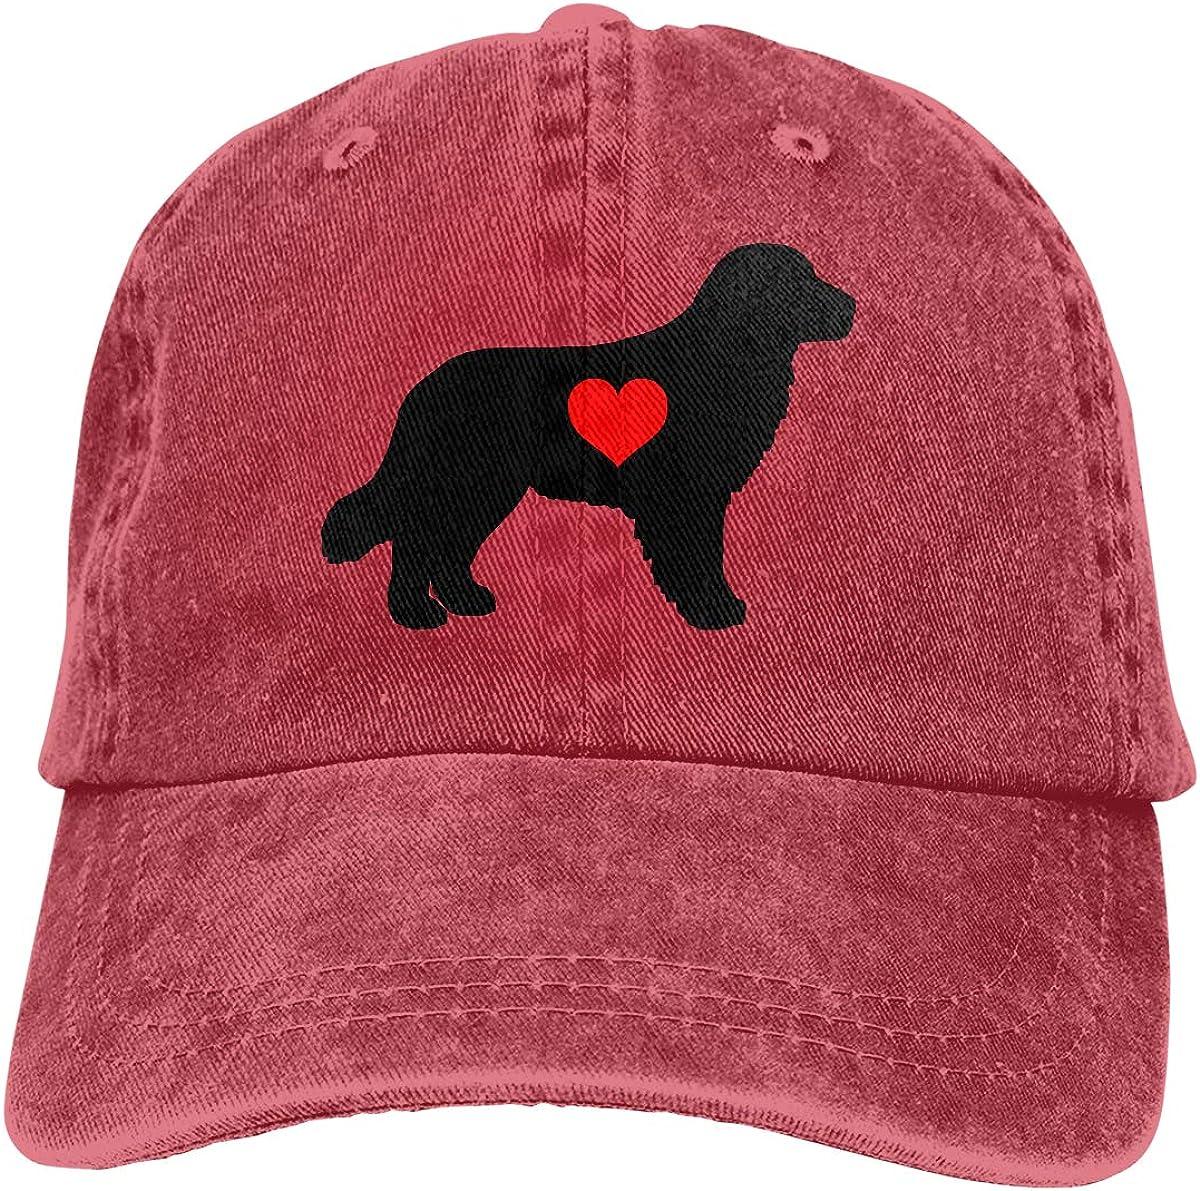 Yarn-Dyed Denim Trucker Hat Golden Retriever with Heart Mens Womens Adjustable Jeans Baseball Hat